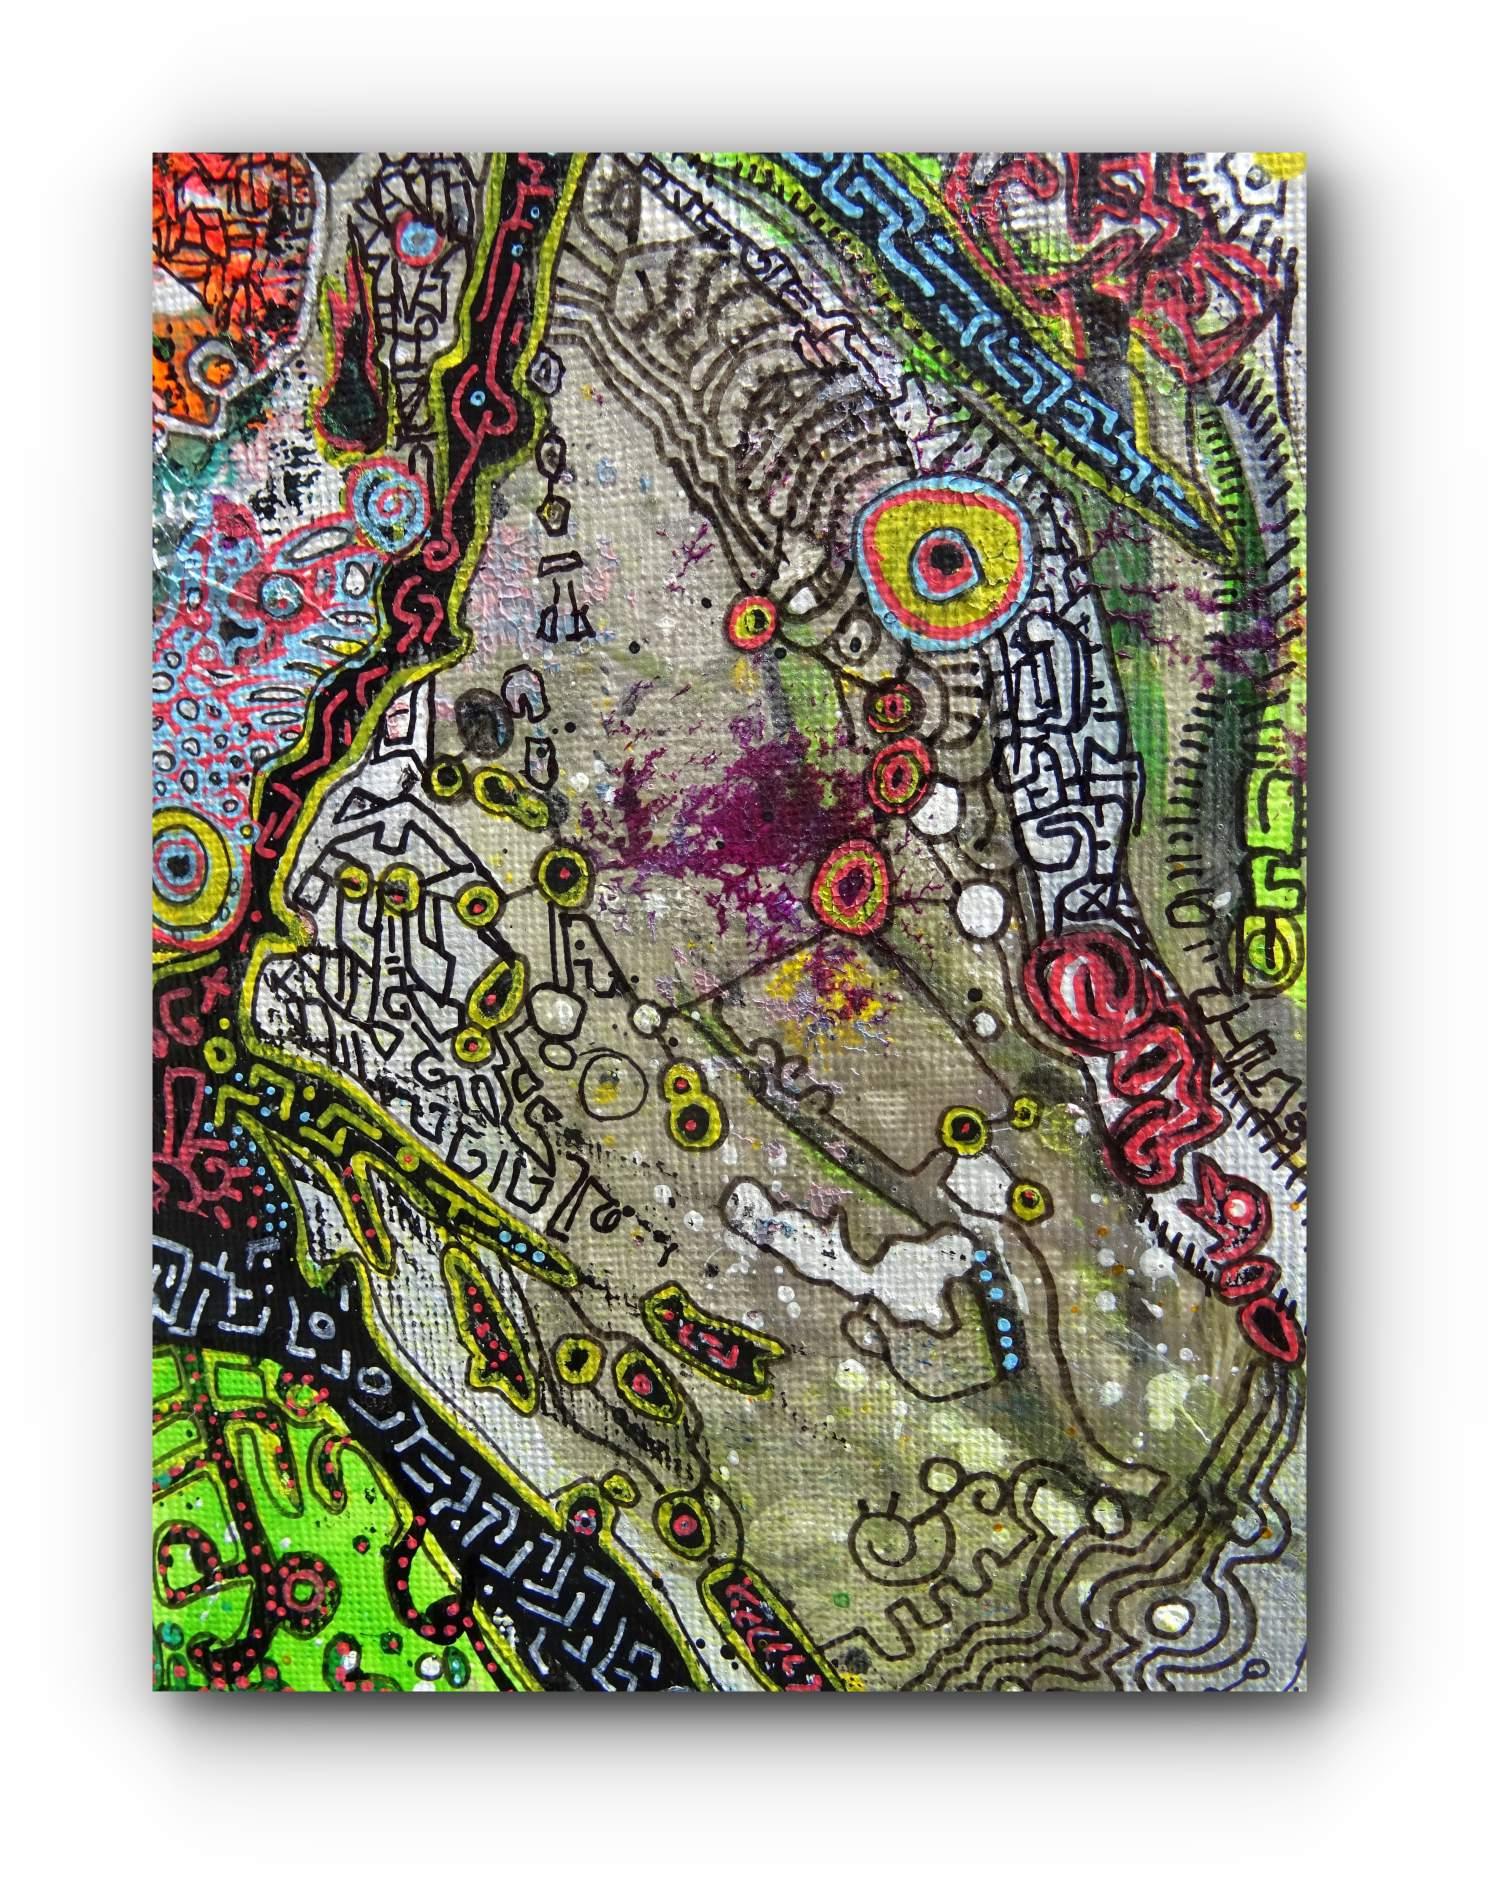 painting-detail-7-ground-control-artists-ingress-vortices.jpg